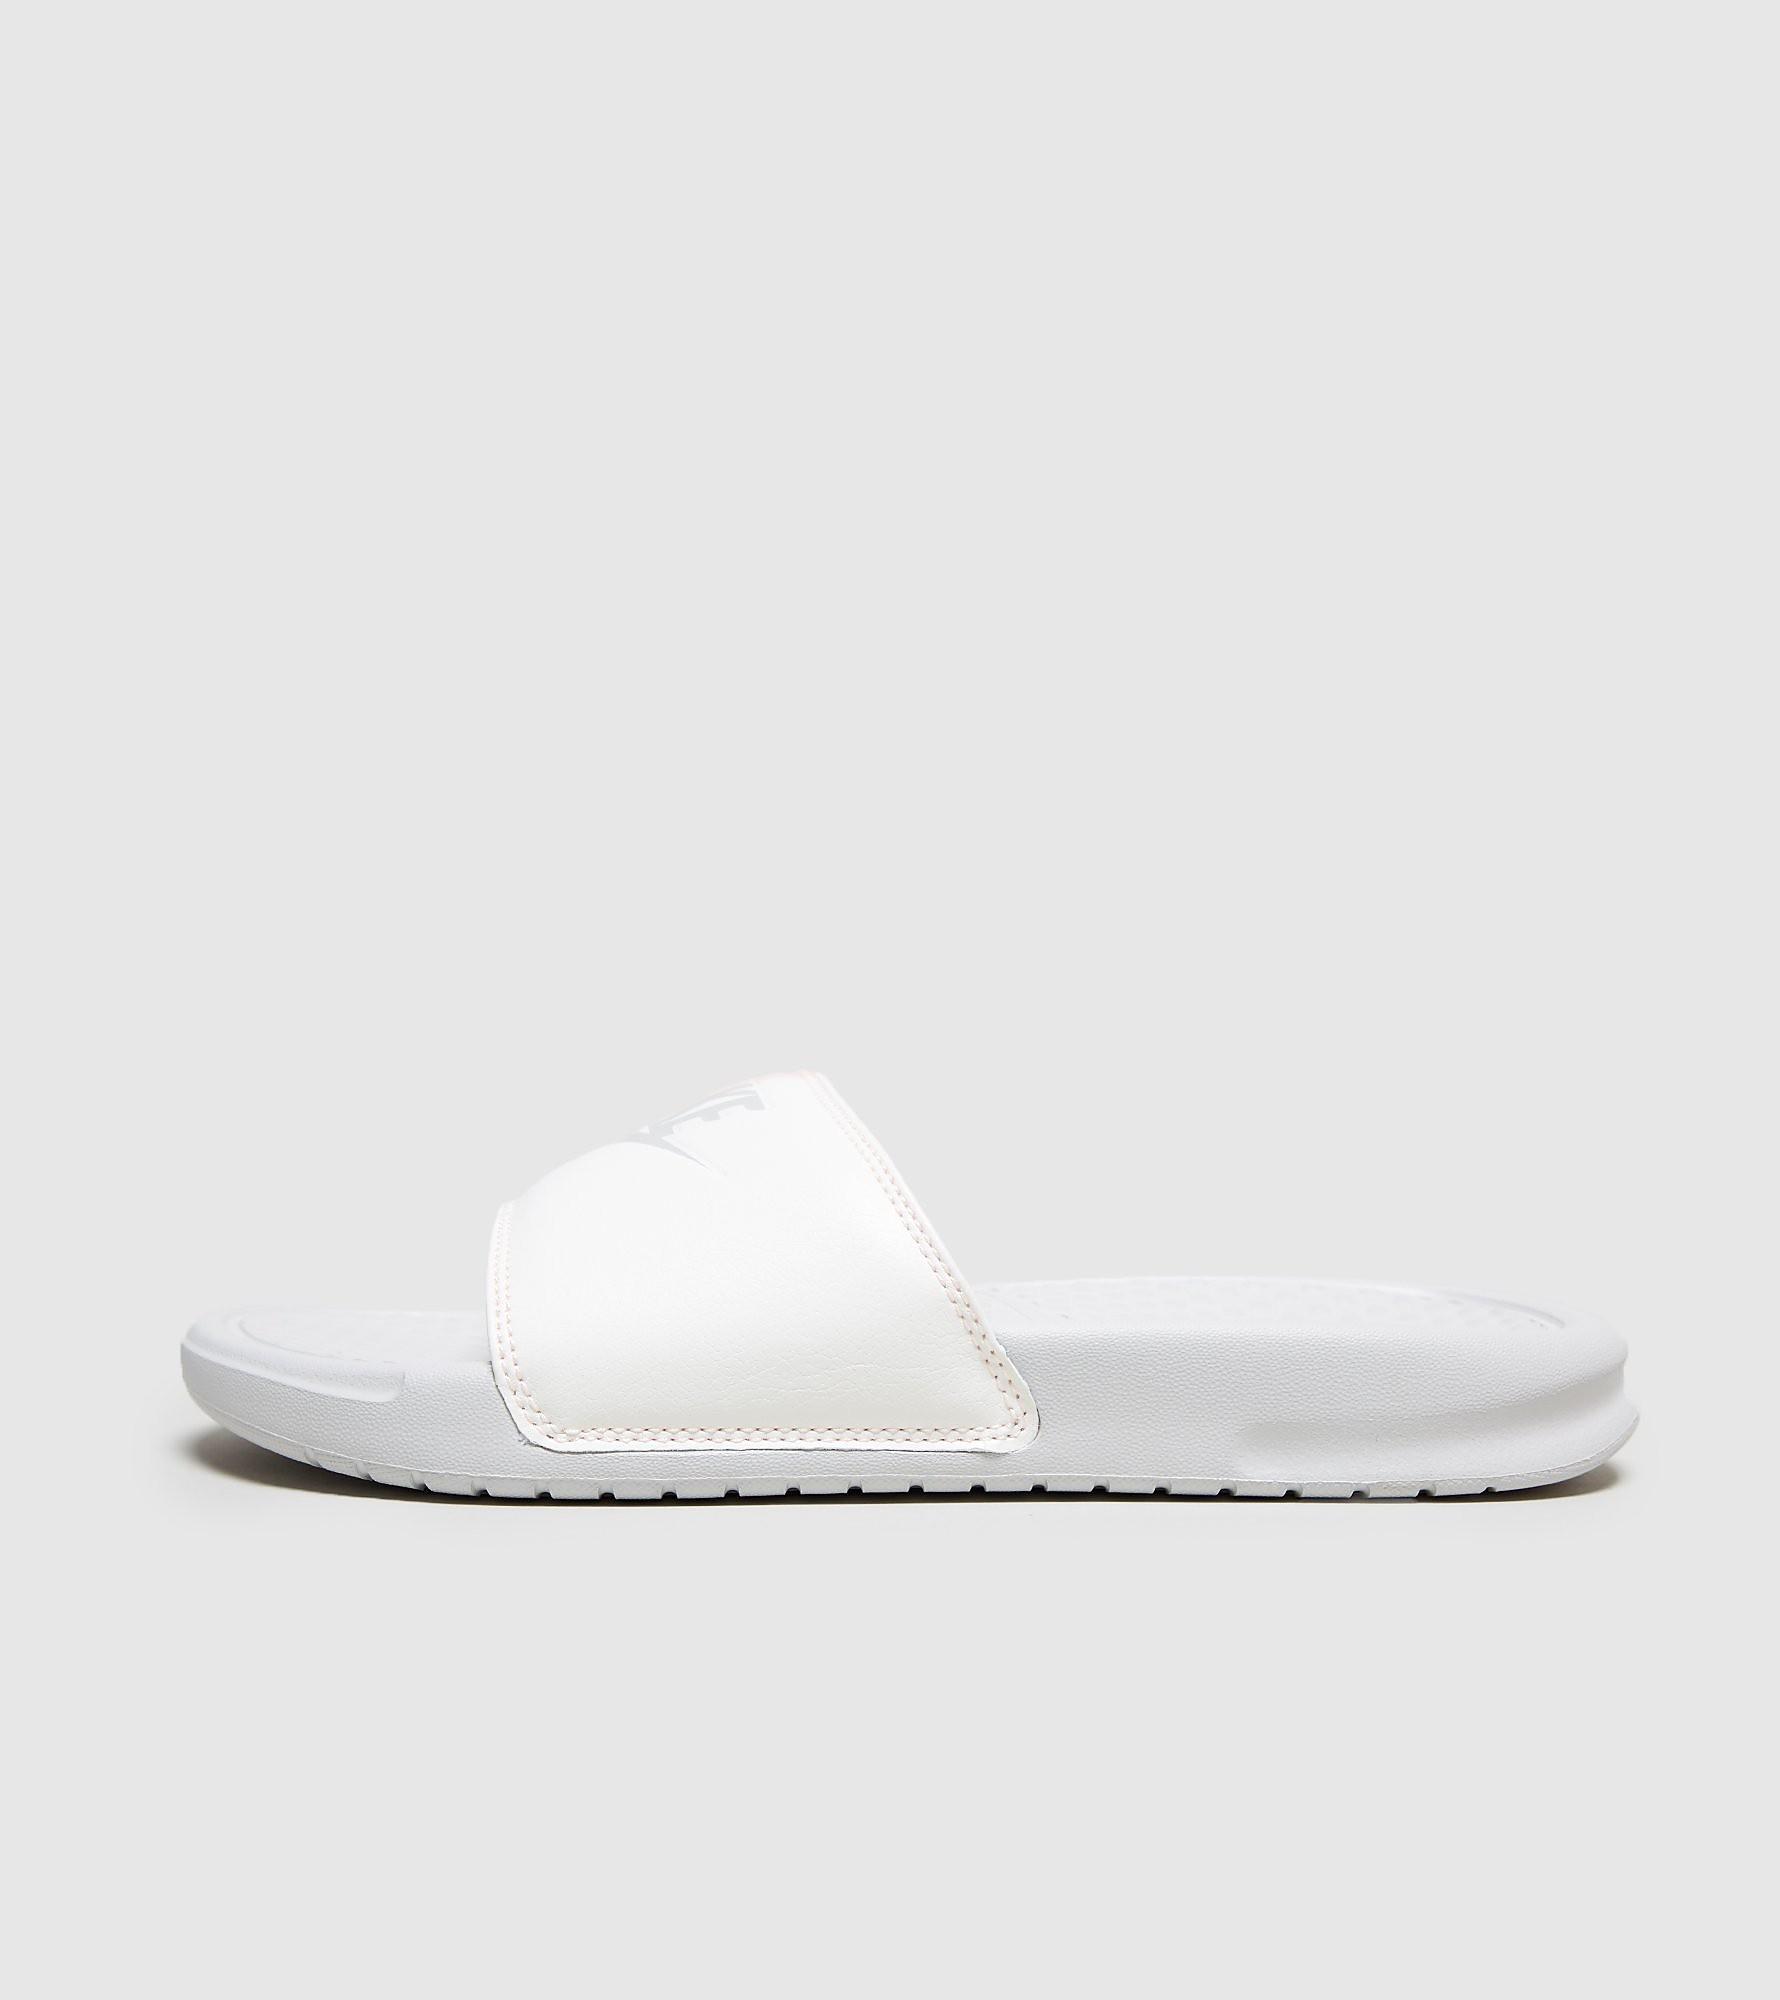 efce4f21d3b Precios de sneakers Nike Benassi baratas (menos de 60€) baratas ...